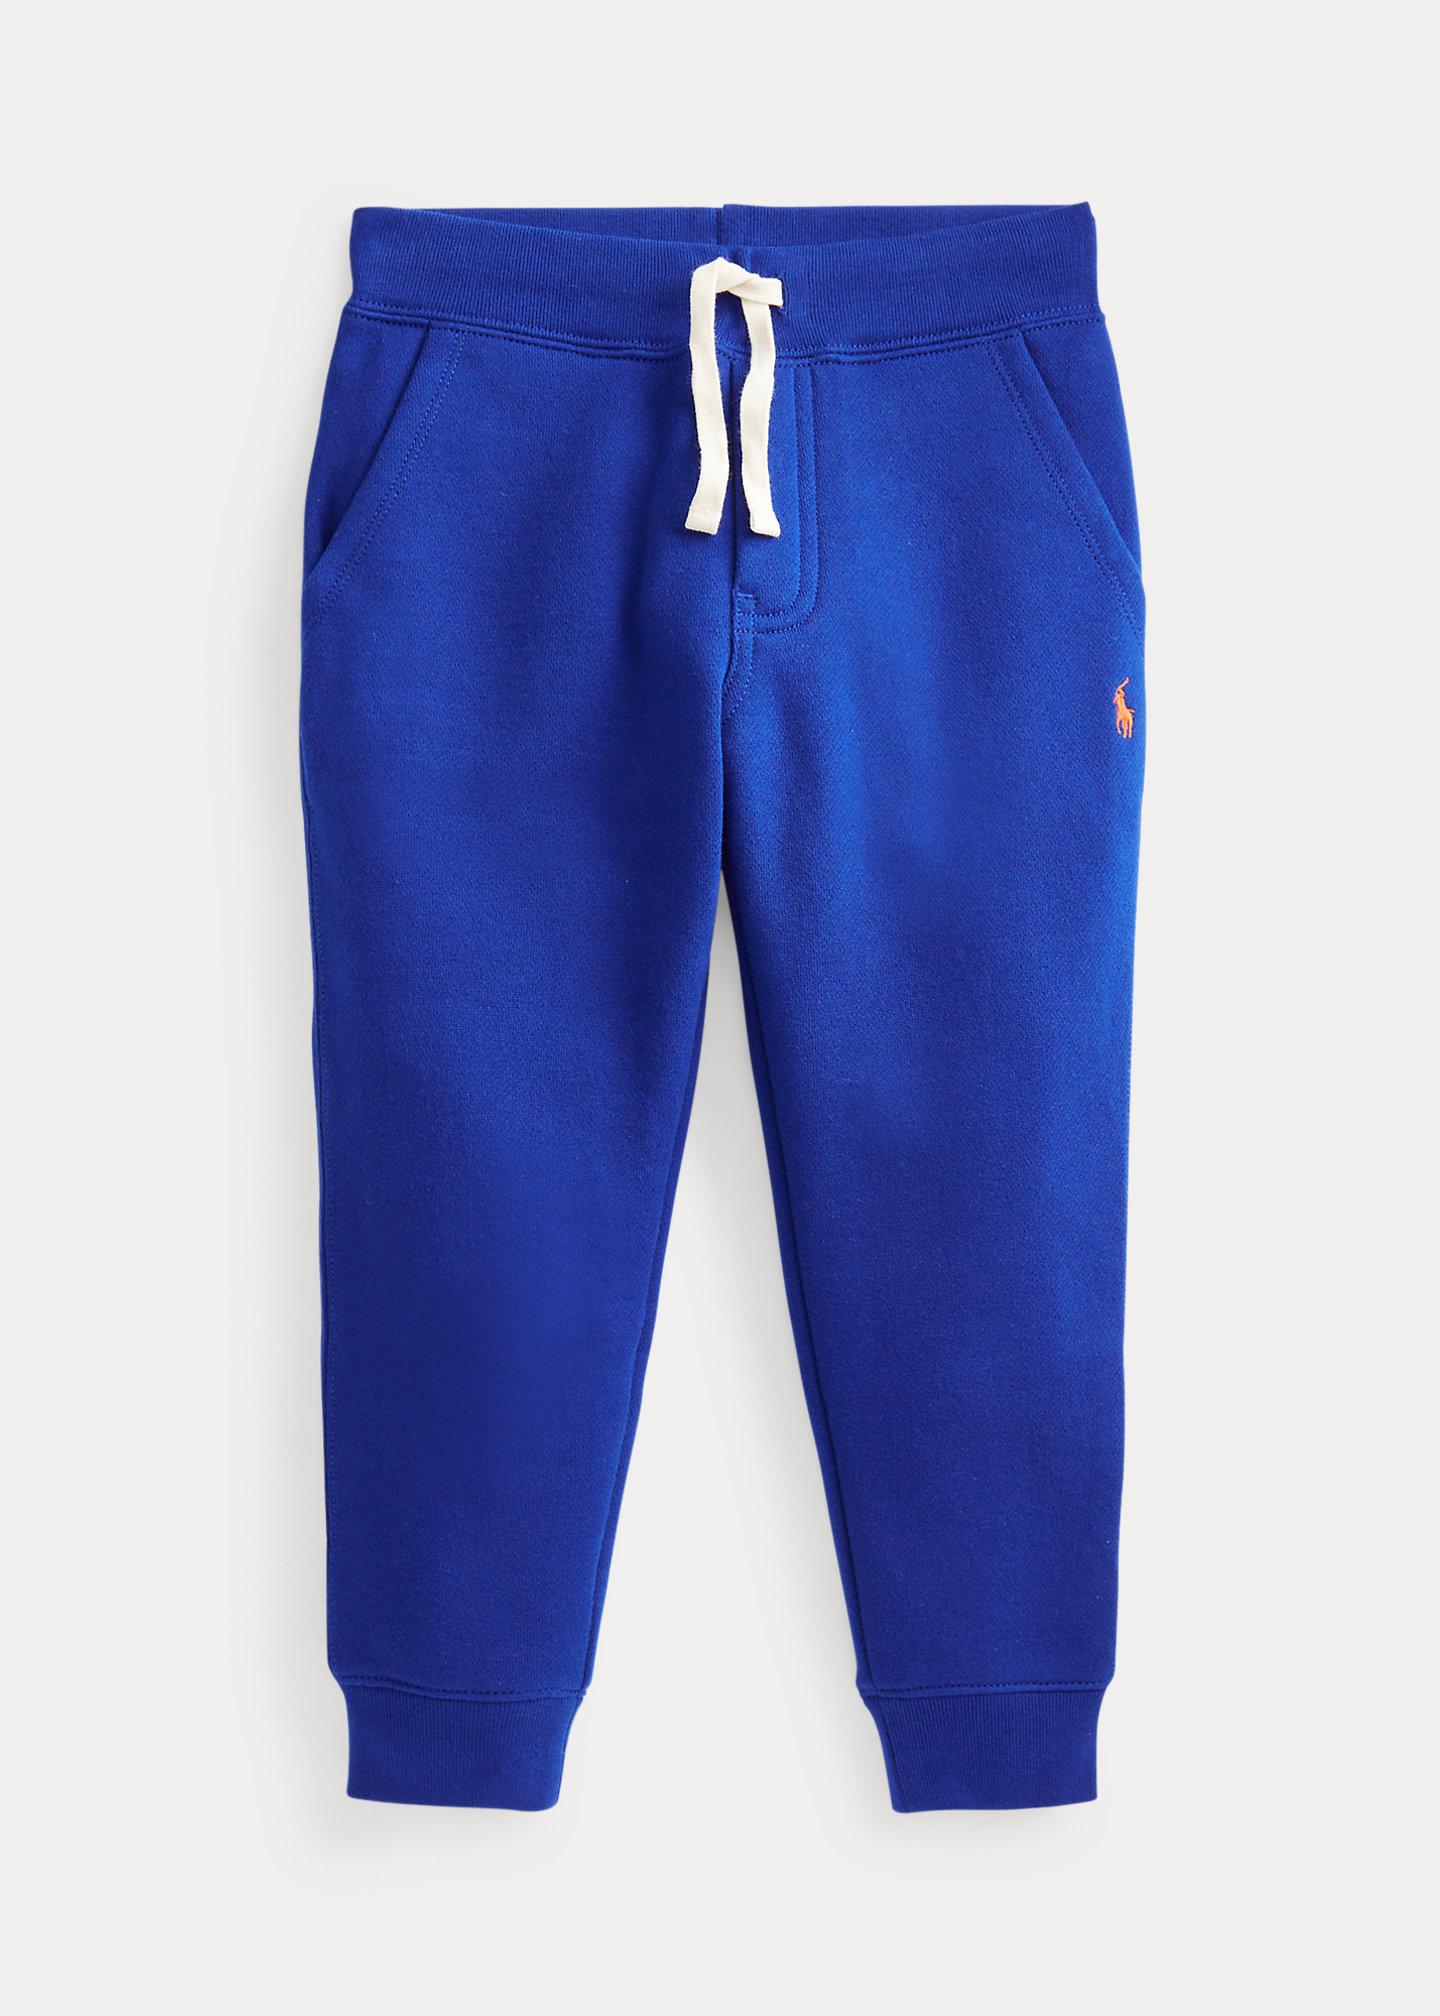 Polo Ralph Lauren Fleece Jogger Pant